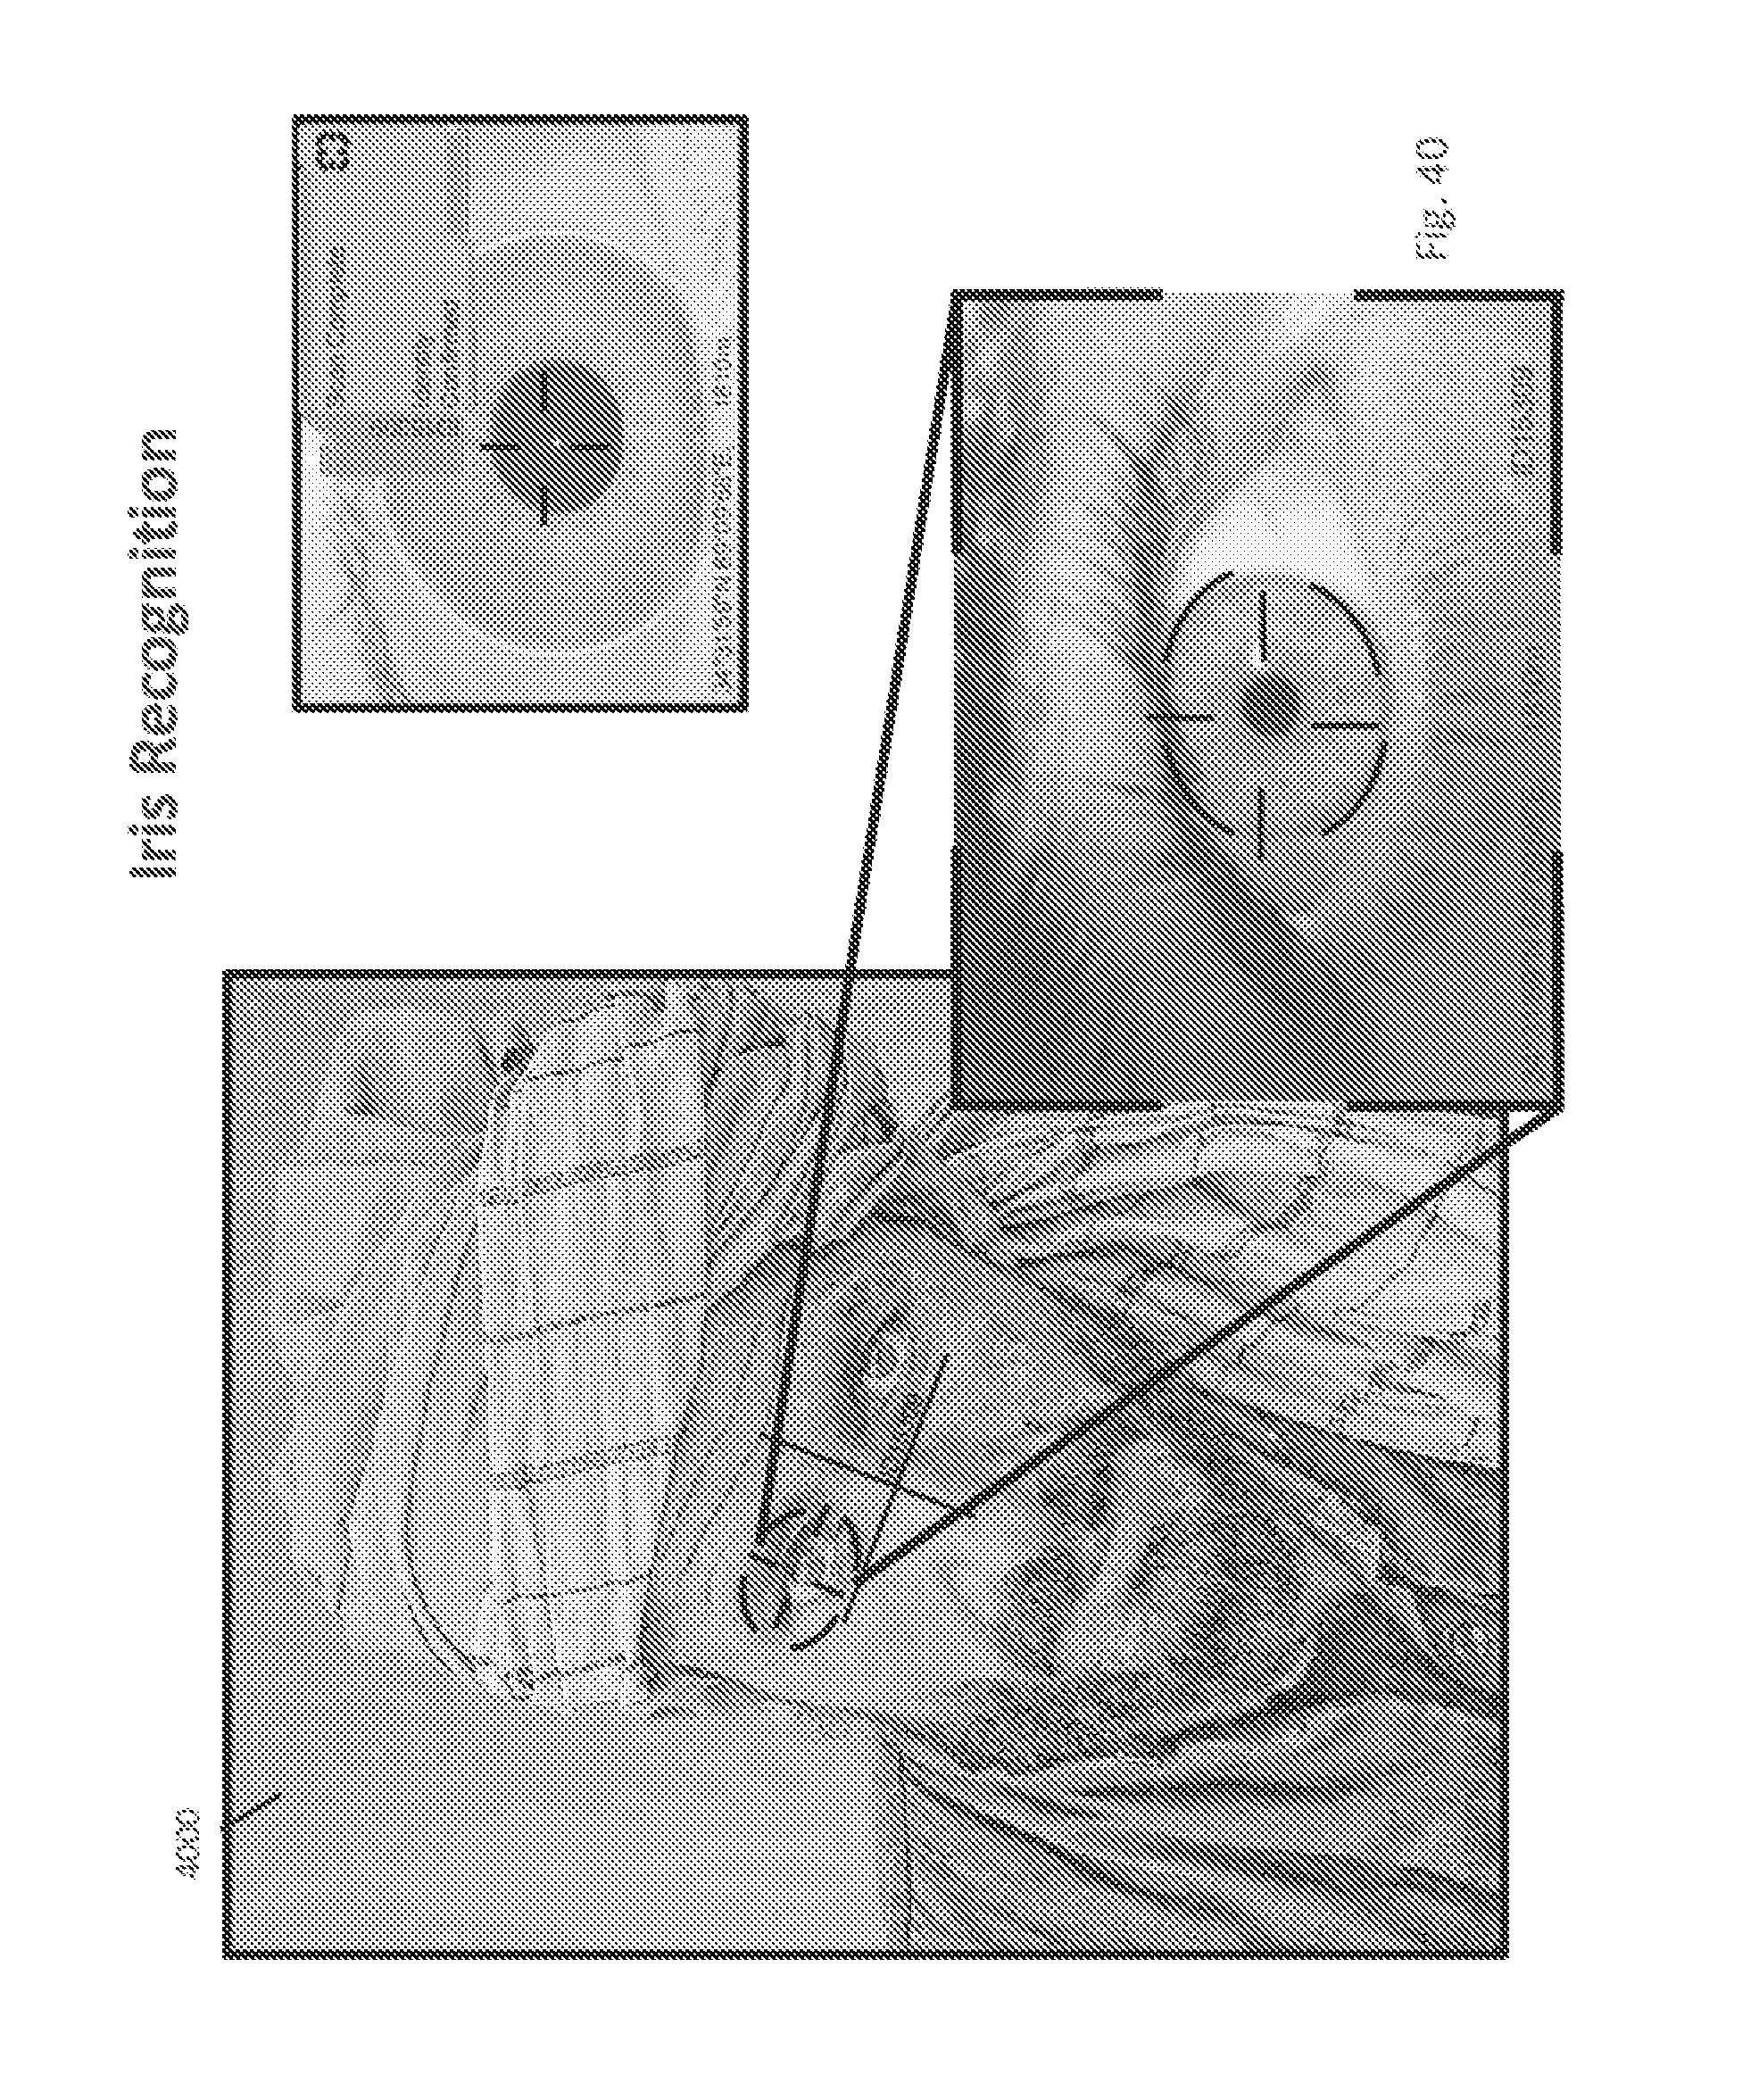 Patent Us 8482859 B2 Car Parking Guard Circuit Using Infrared Sensor Explanation Images